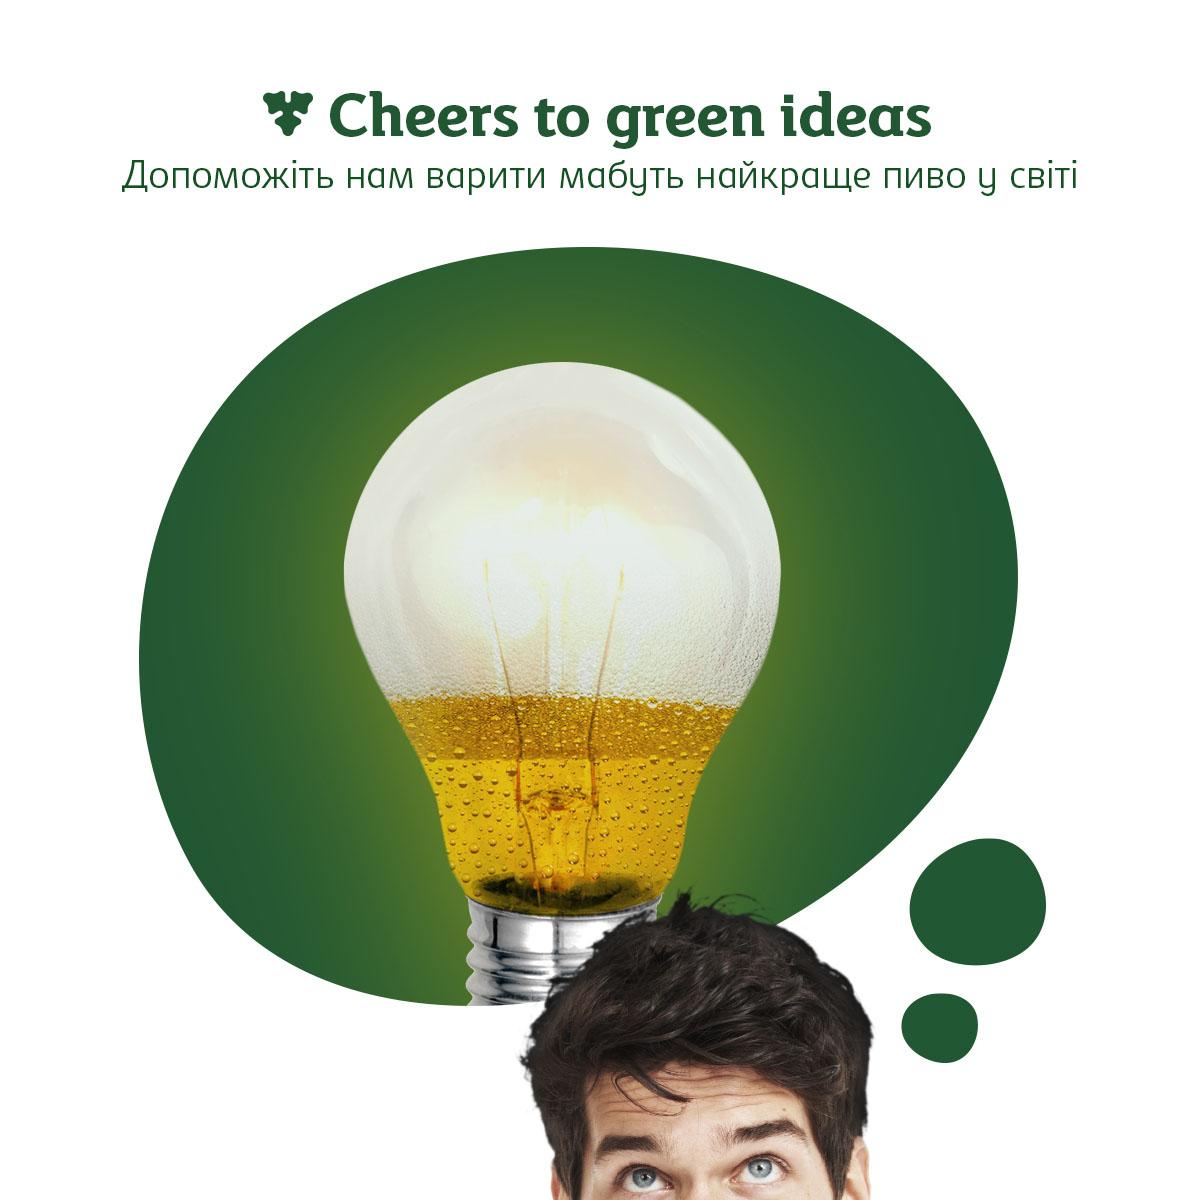 Фото: Carlsberg объявляет о запуске краудсорсинговой программы «Cheers to Green Ideas».